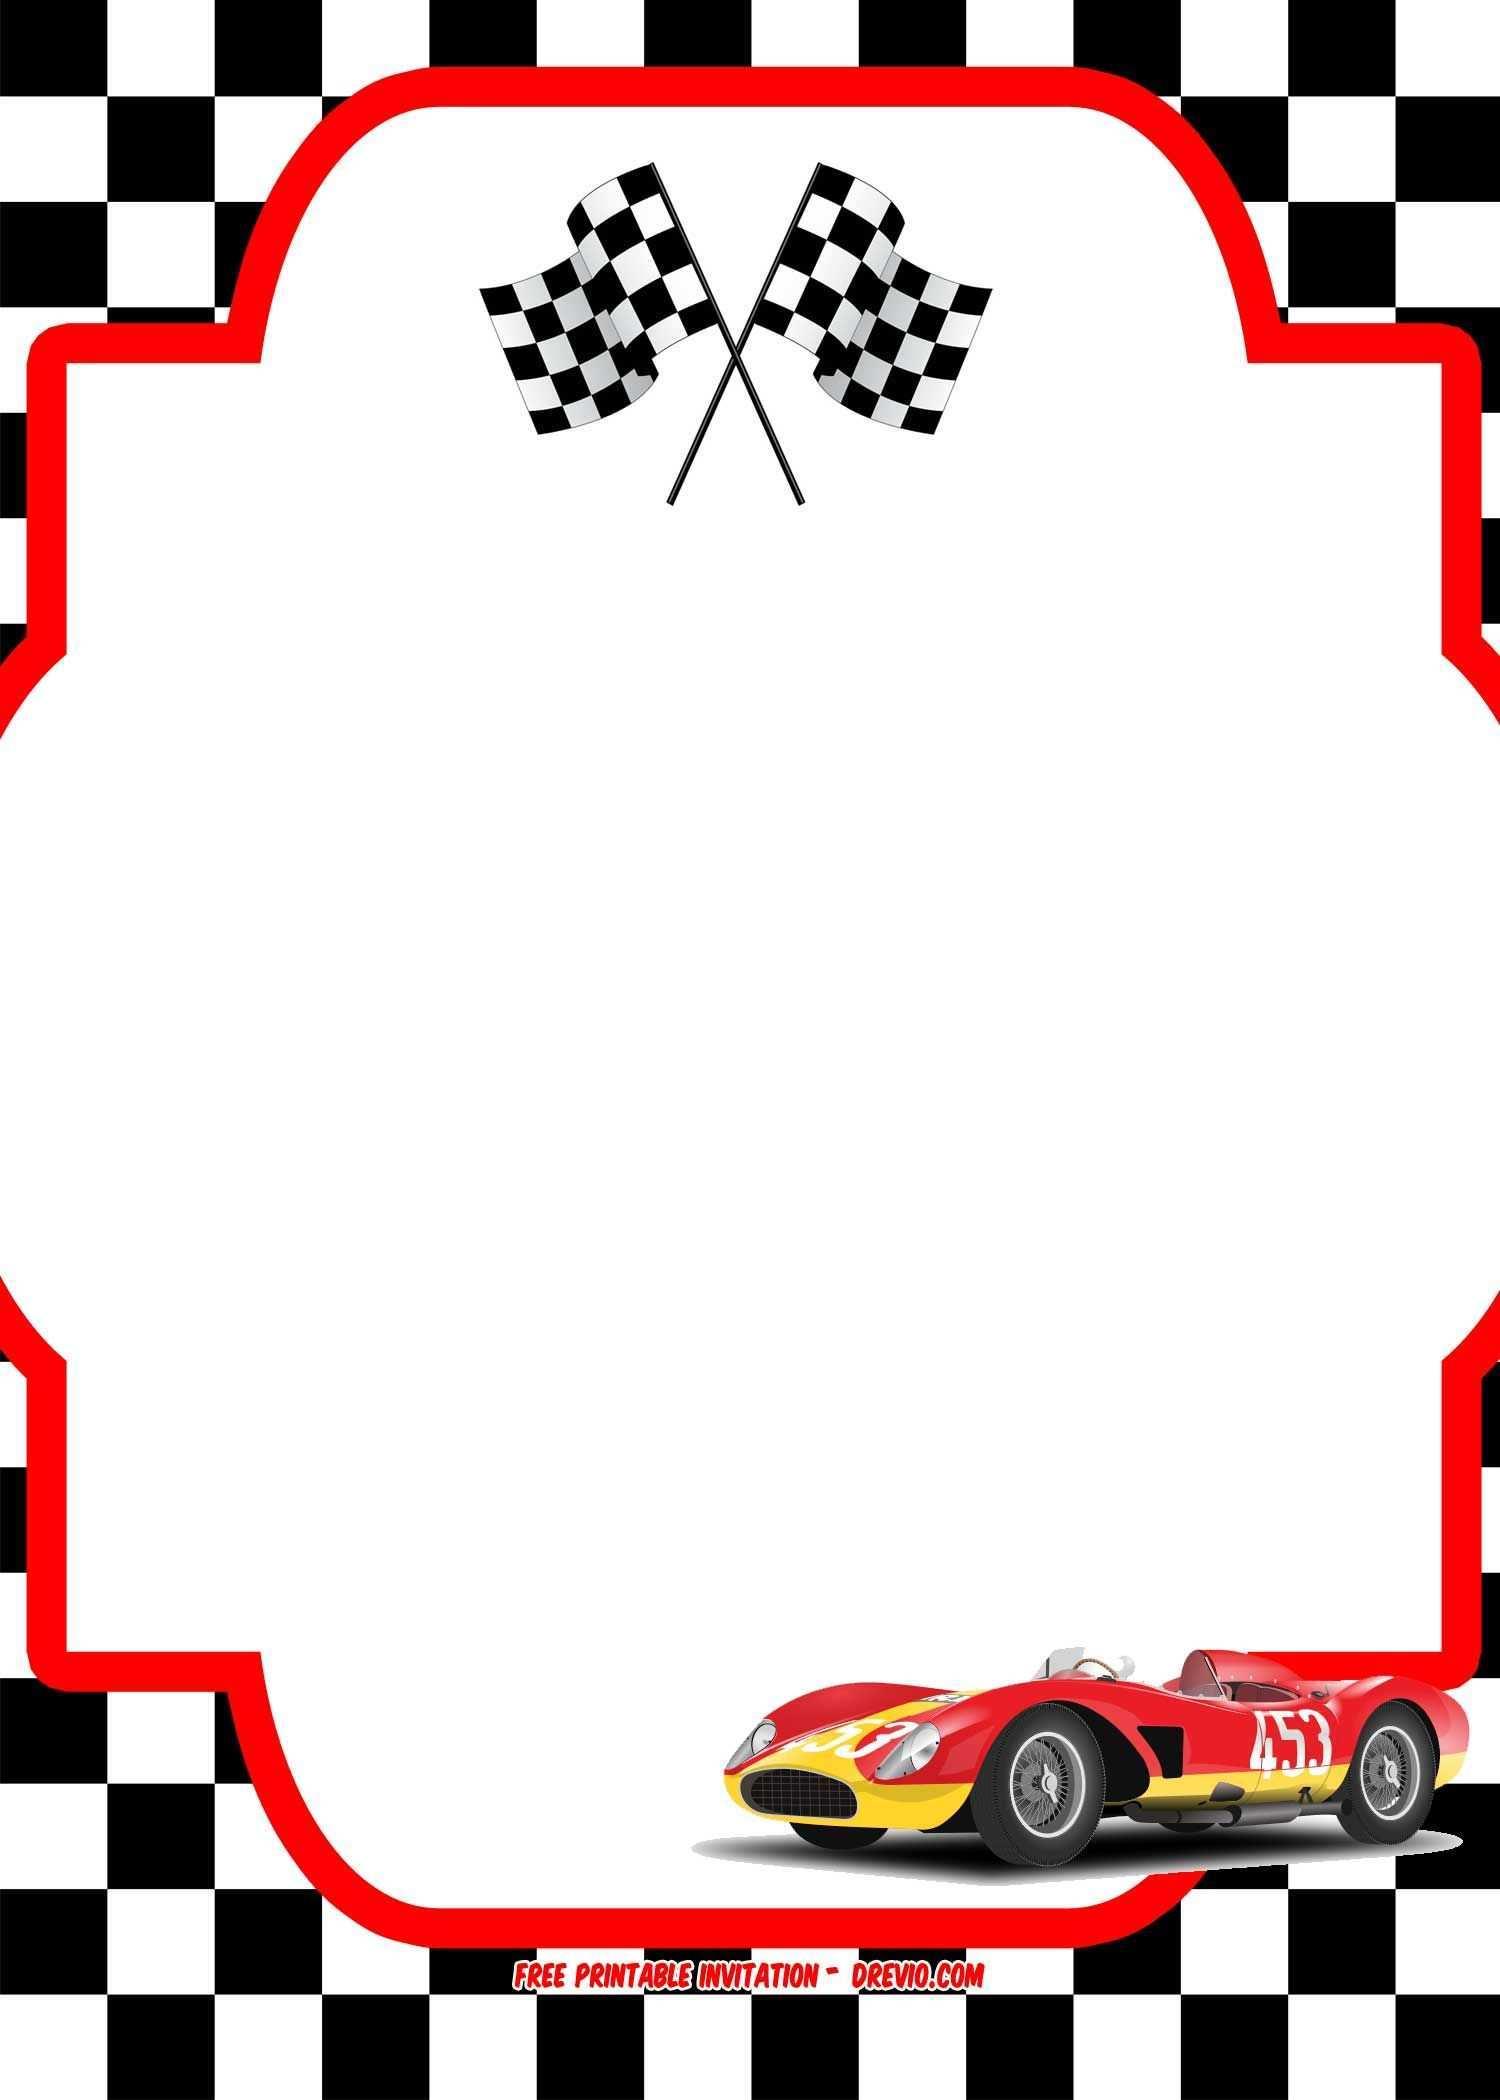 Free Race Car Birthday Invitation Template Printable Drevio Cars Birthday Invitations Cars Invitation Race Car Birthday